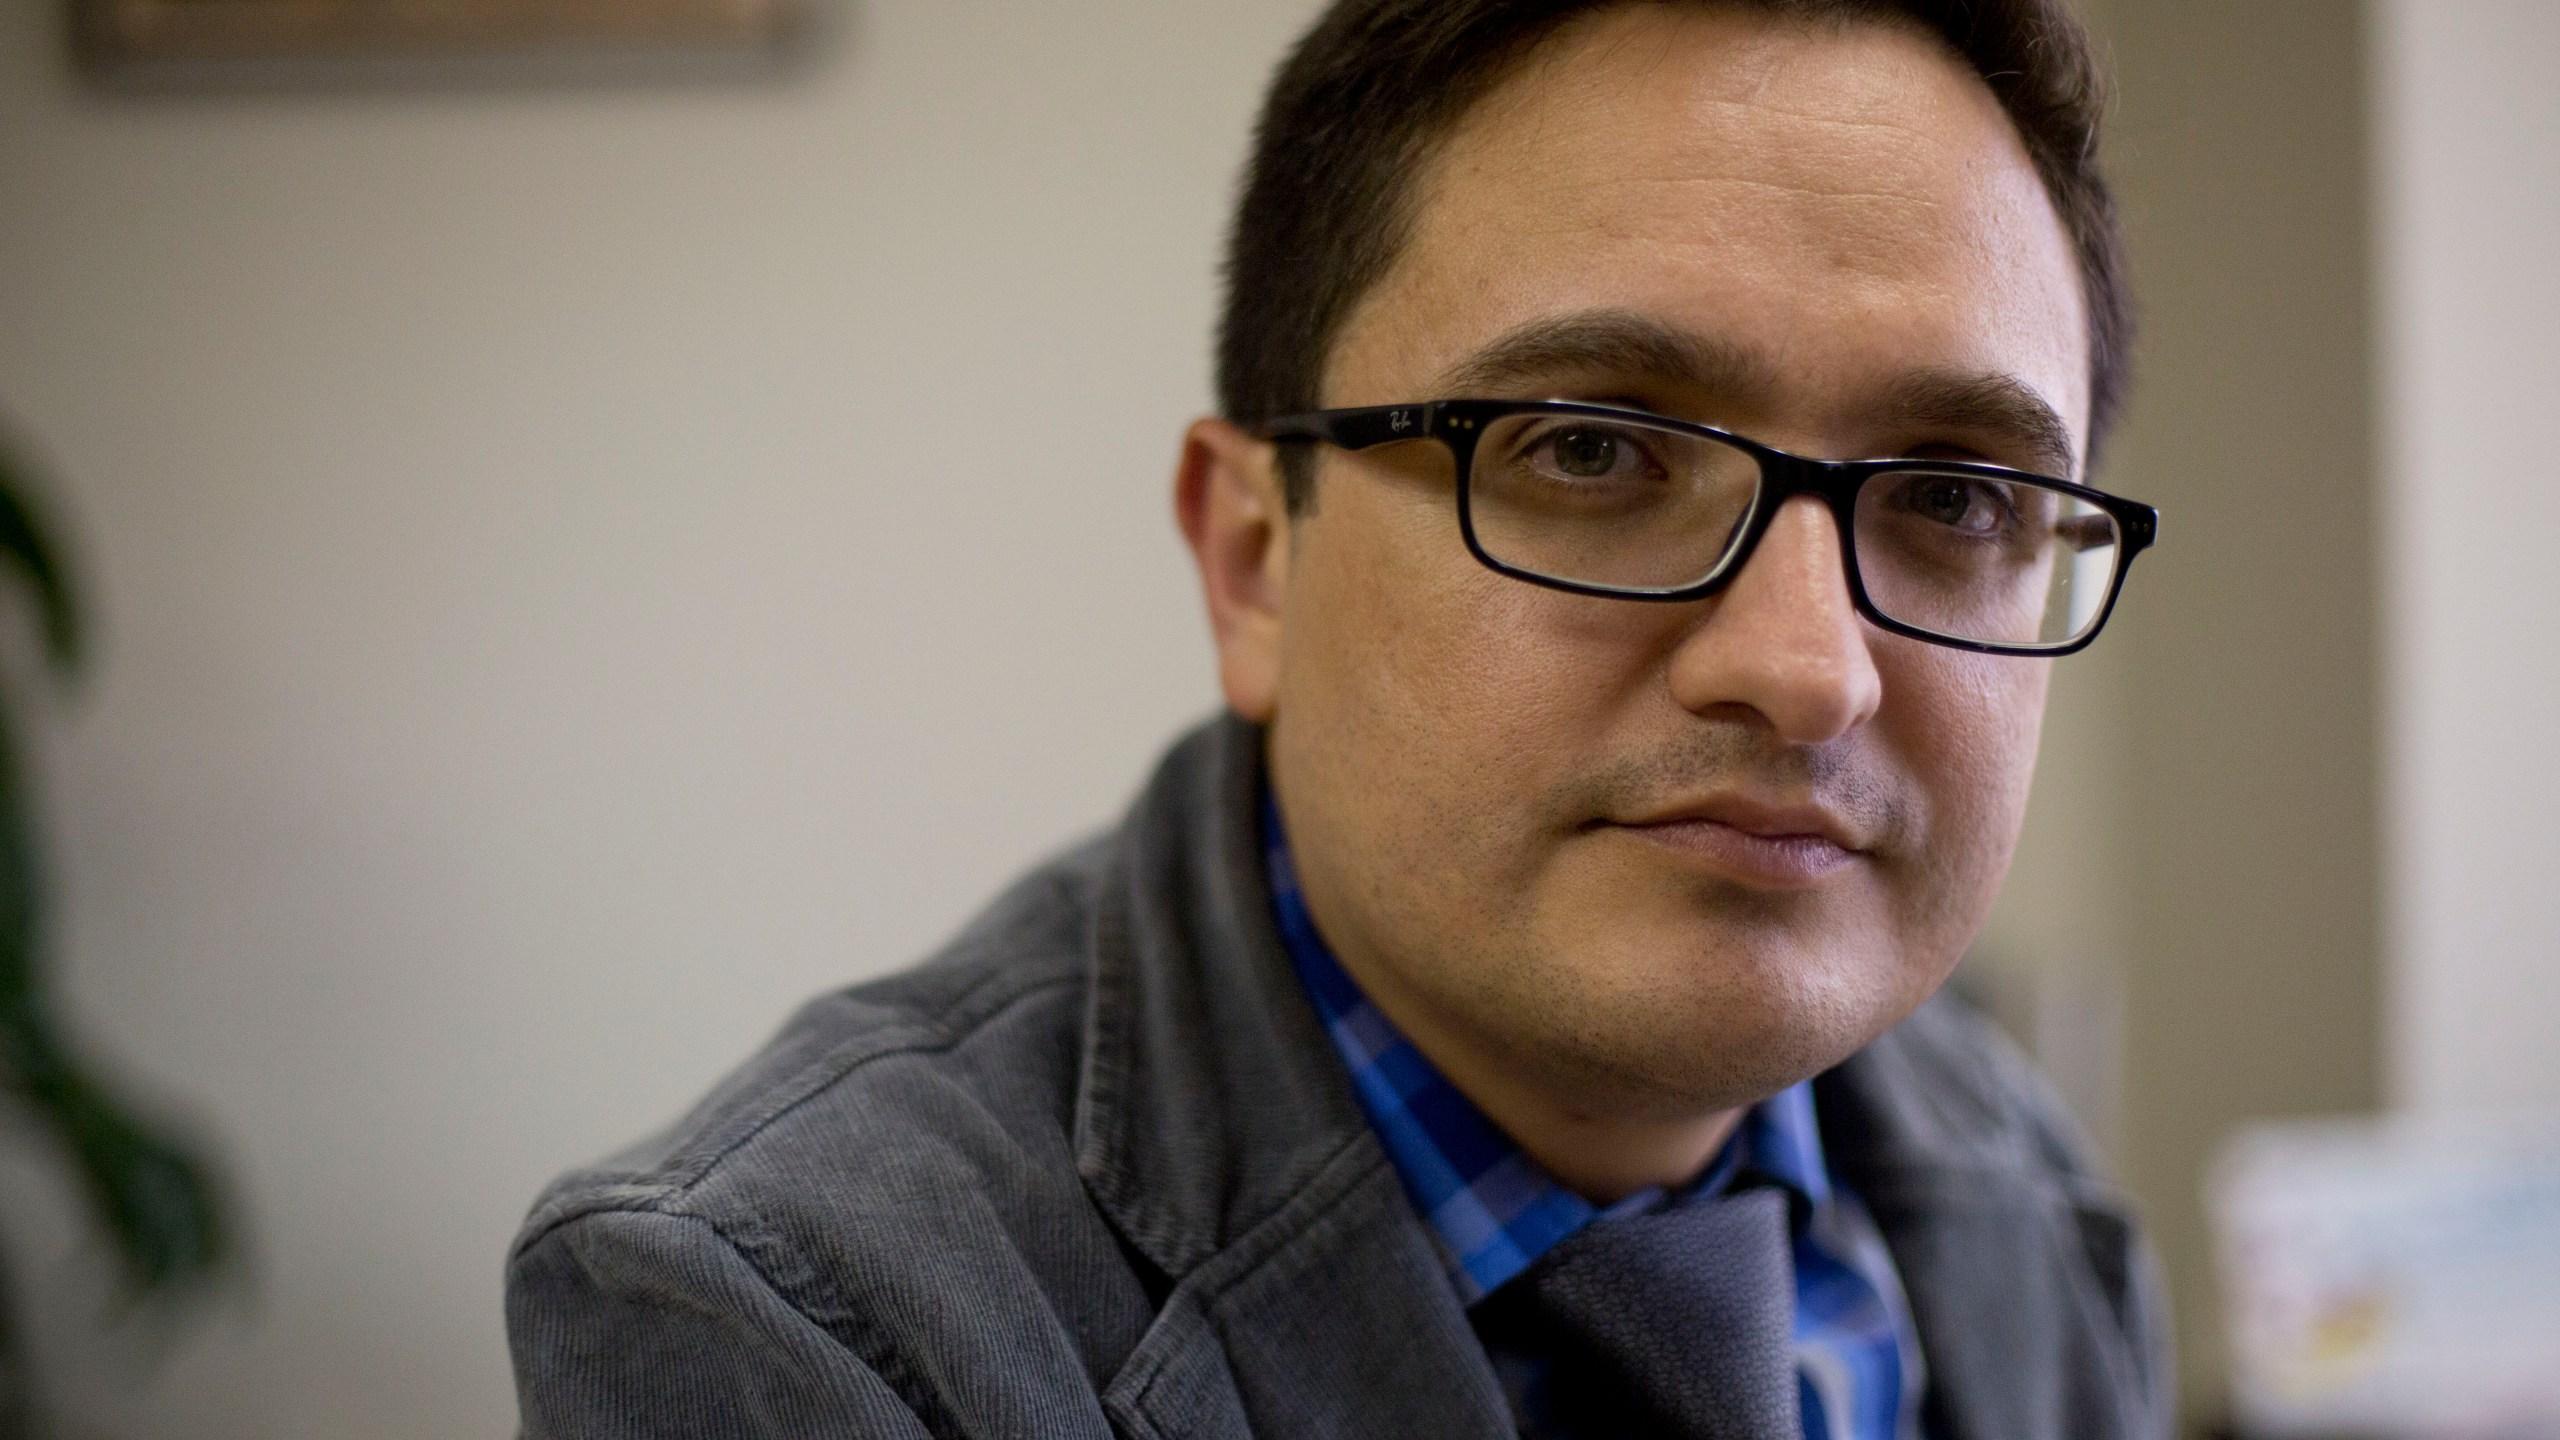 Juan Francisco Sandoval